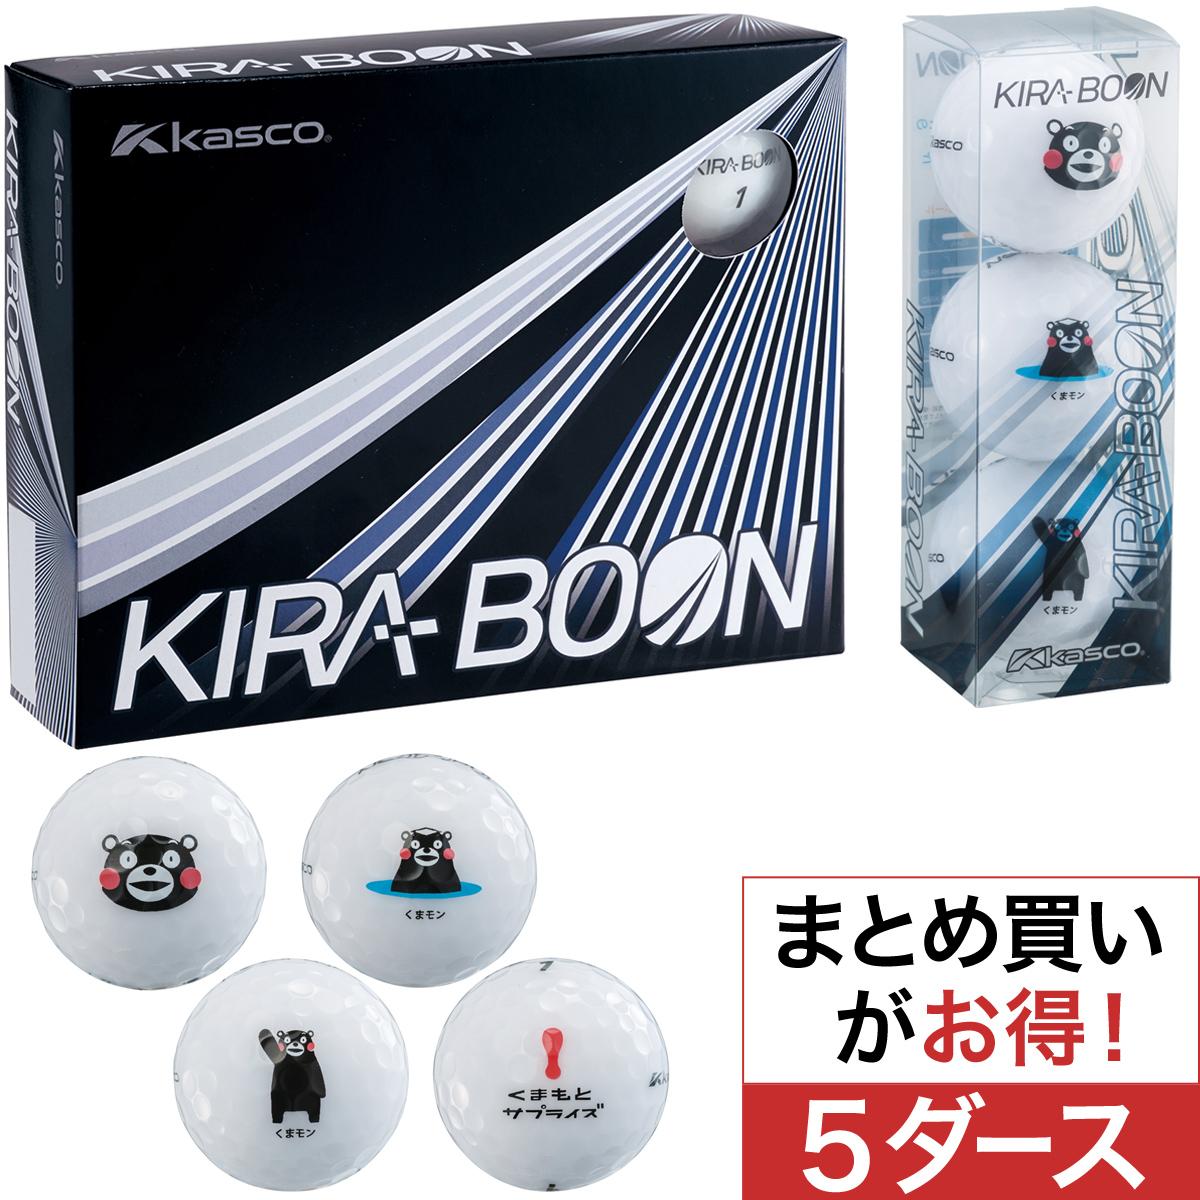 KIRA BOON くまモン ボール 5ダースセット